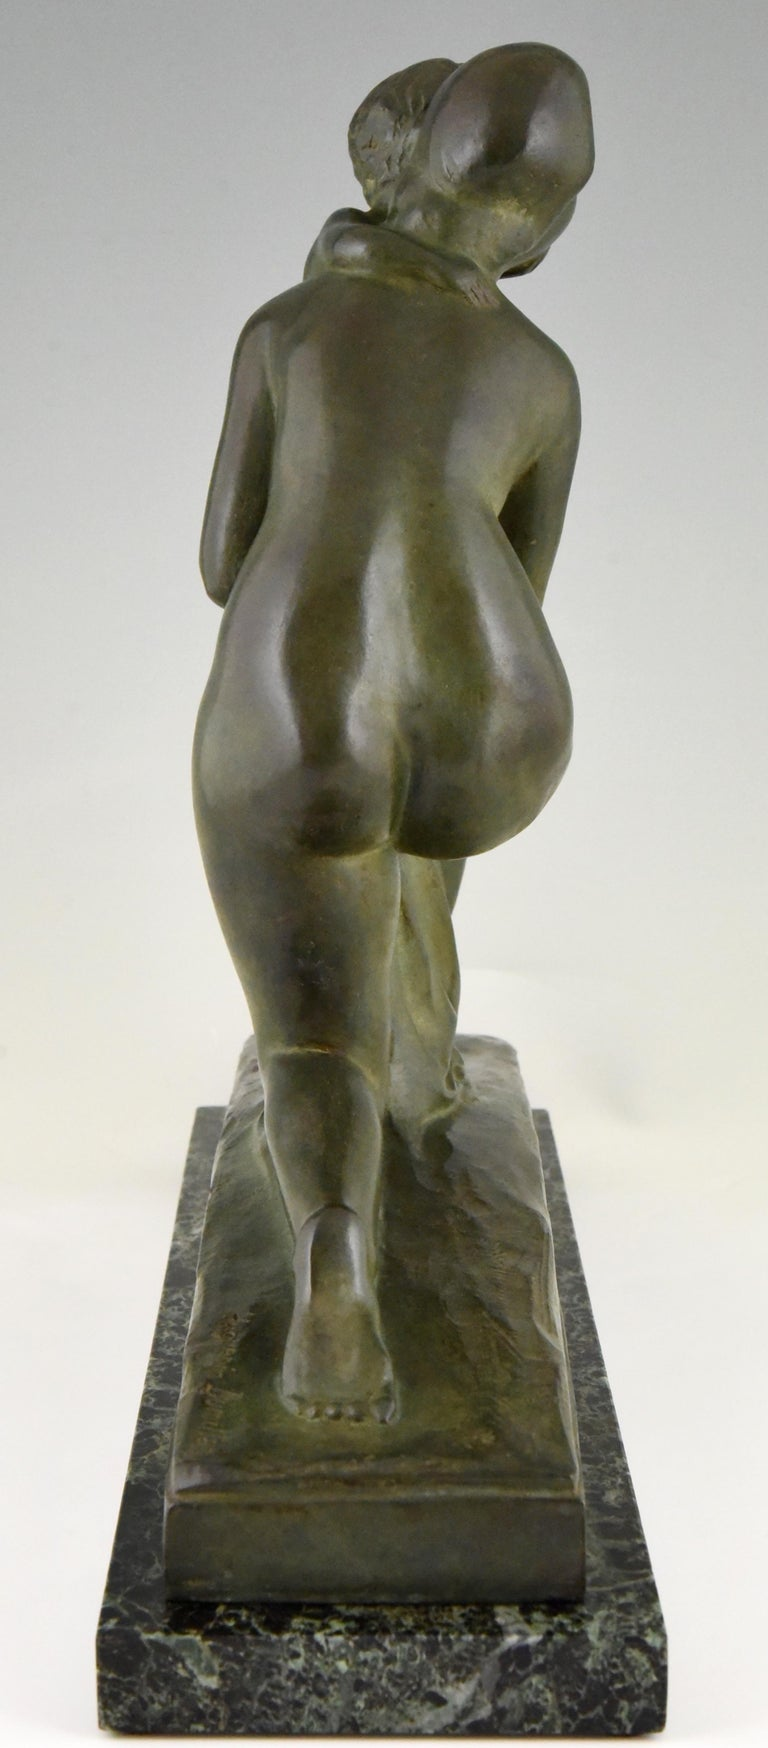 Art Deco Bronze Sculpture Mother and Child Motherhood André Huguenin Dumittan For Sale 1